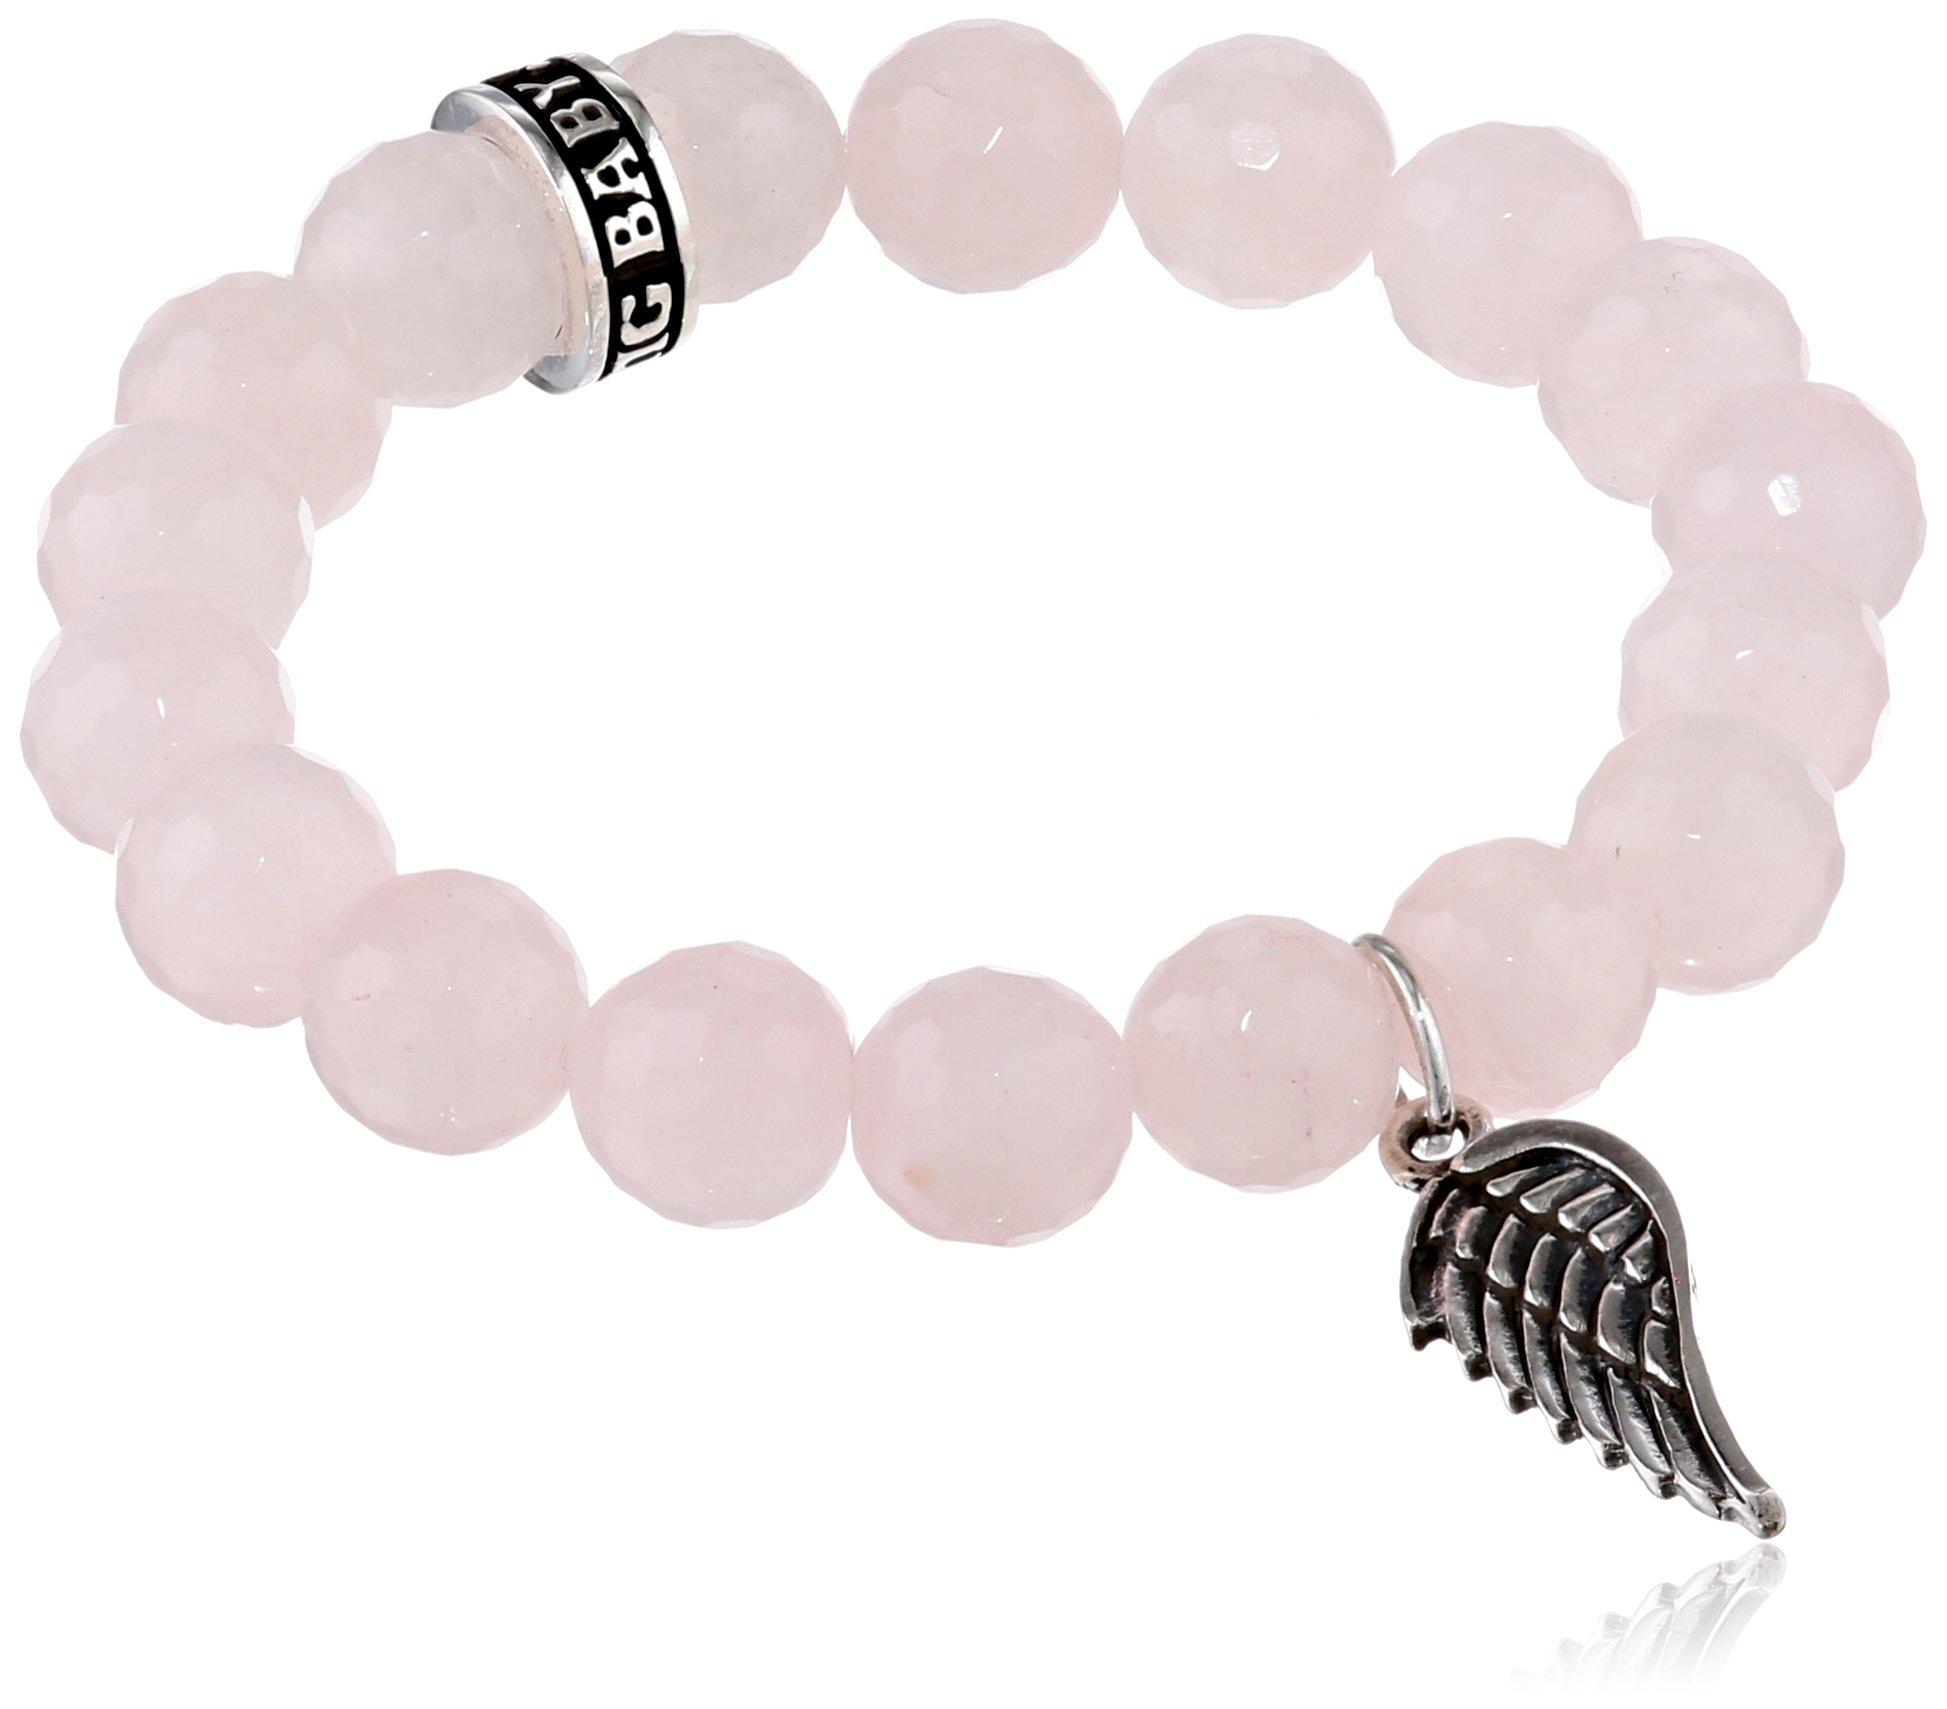 King Baby Rose Quartz with Silver Ring Bracelet